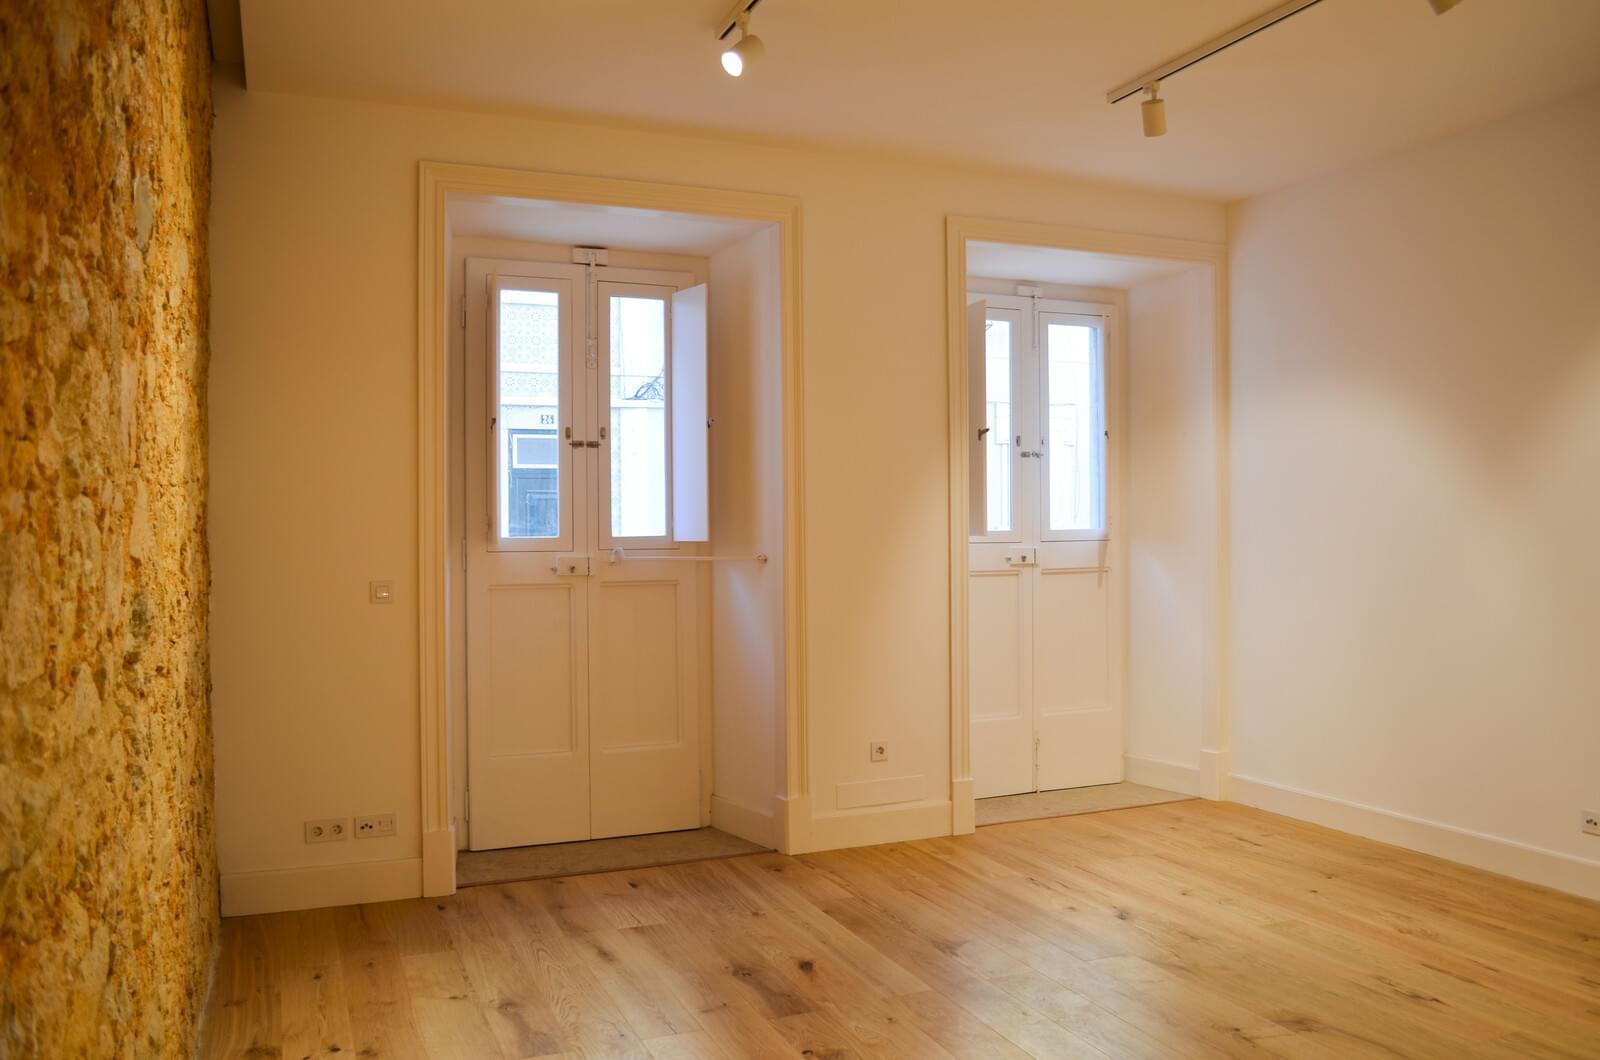 pf18801-apartamento-t2-lisboa-cd61b818-4da5-44ec-98dc-dc727a852b64